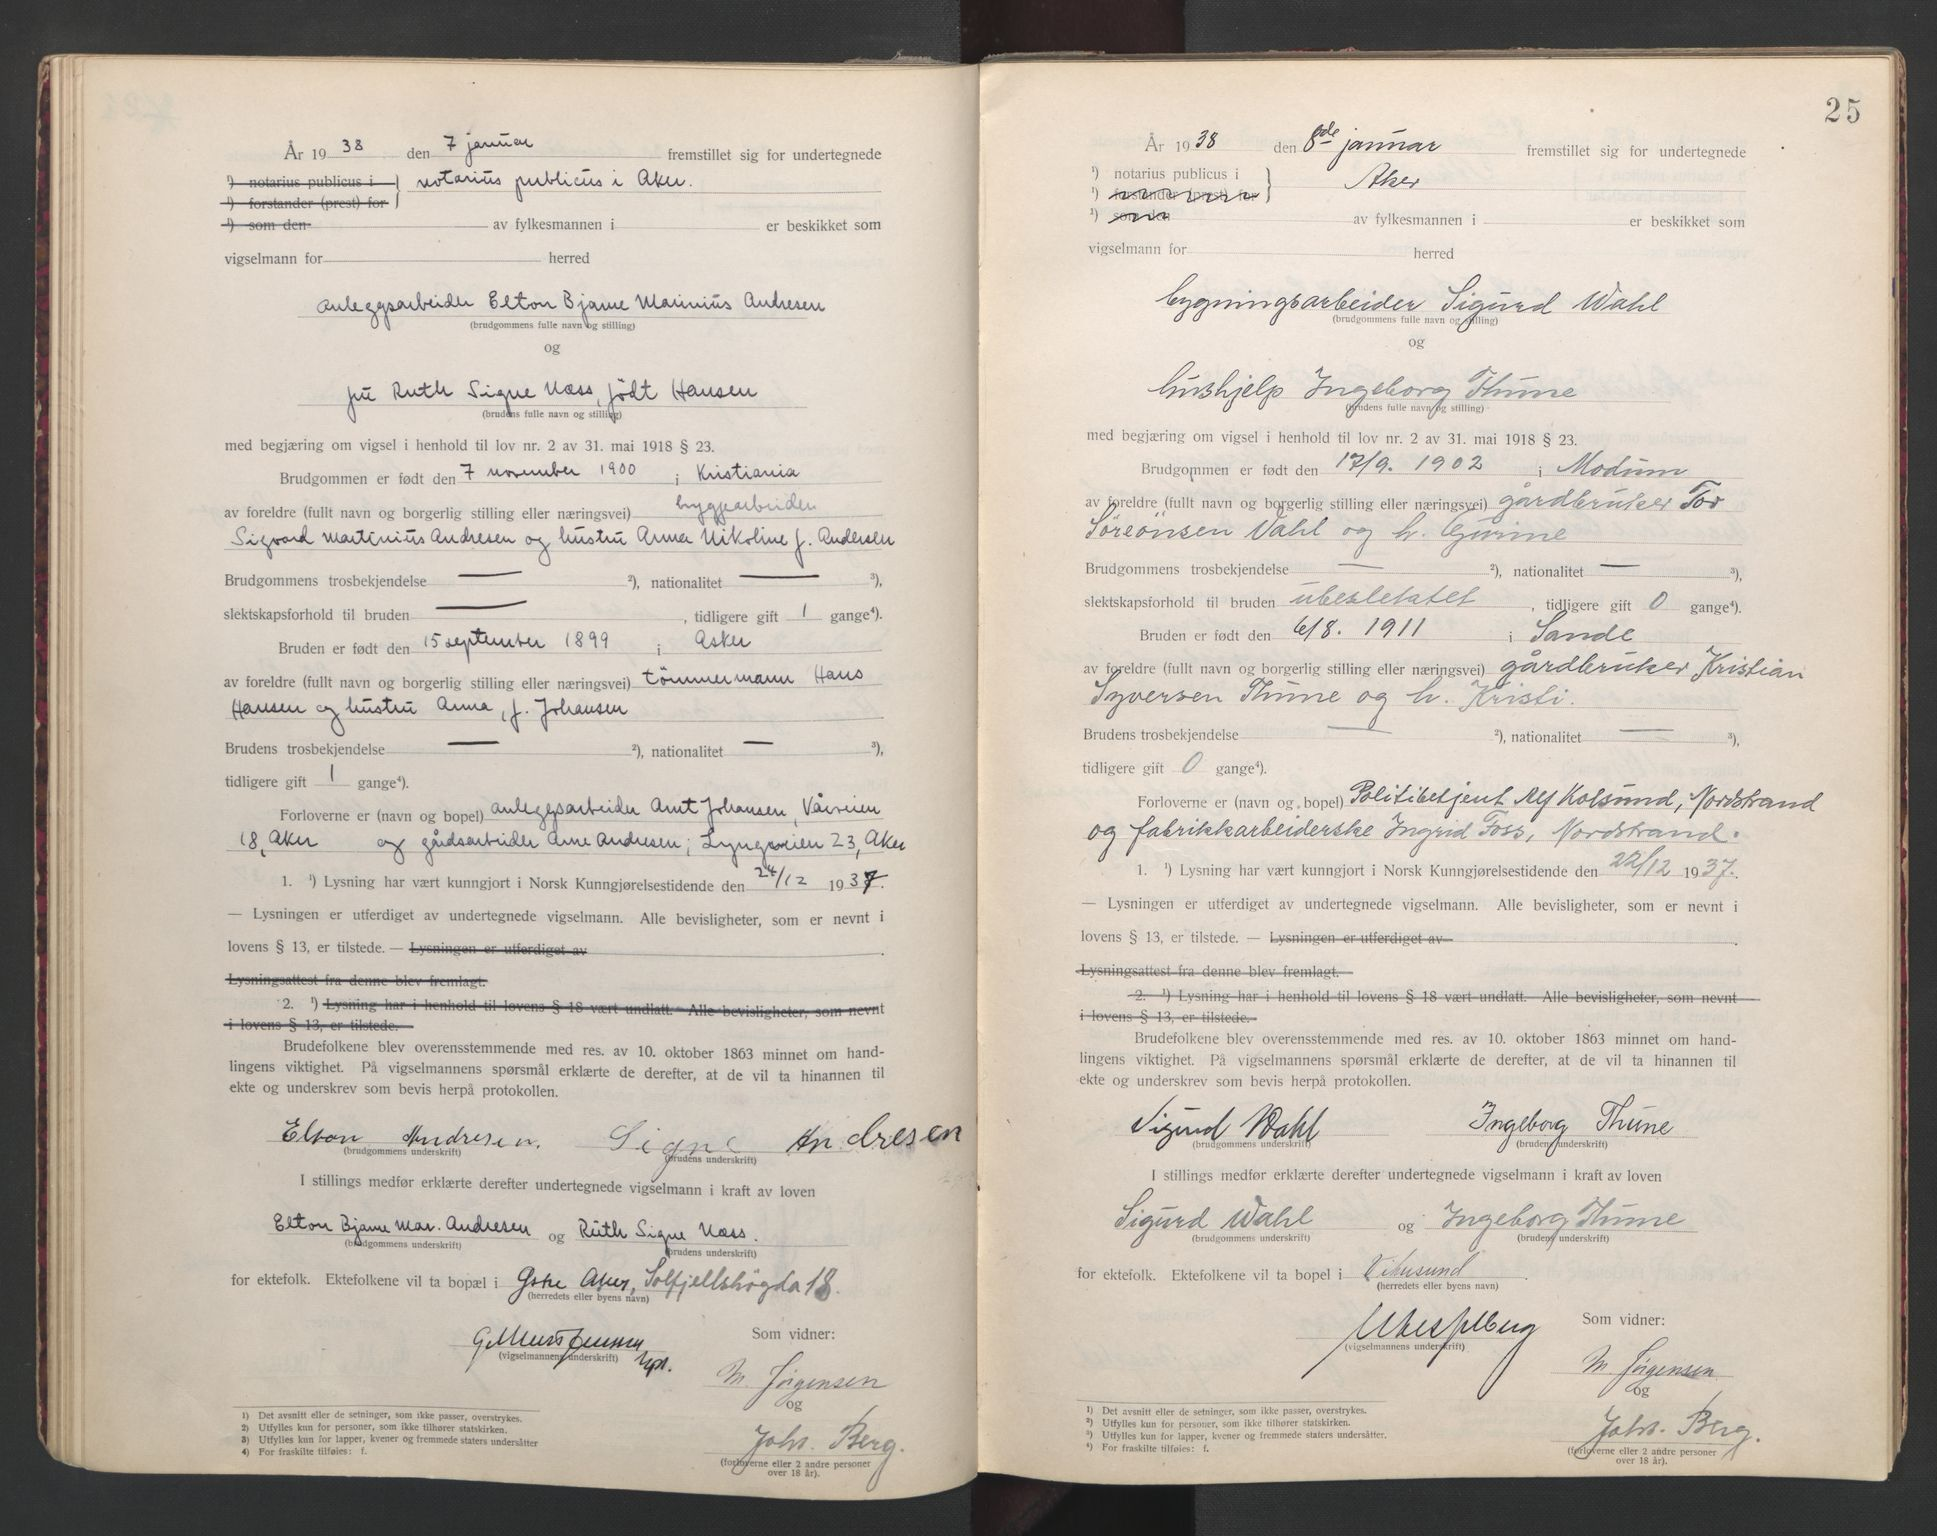 SAO, Aker sorenskriveri, L/Lc/Lcb/L0010: Vigselprotokoll, 1937-1938, s. 25